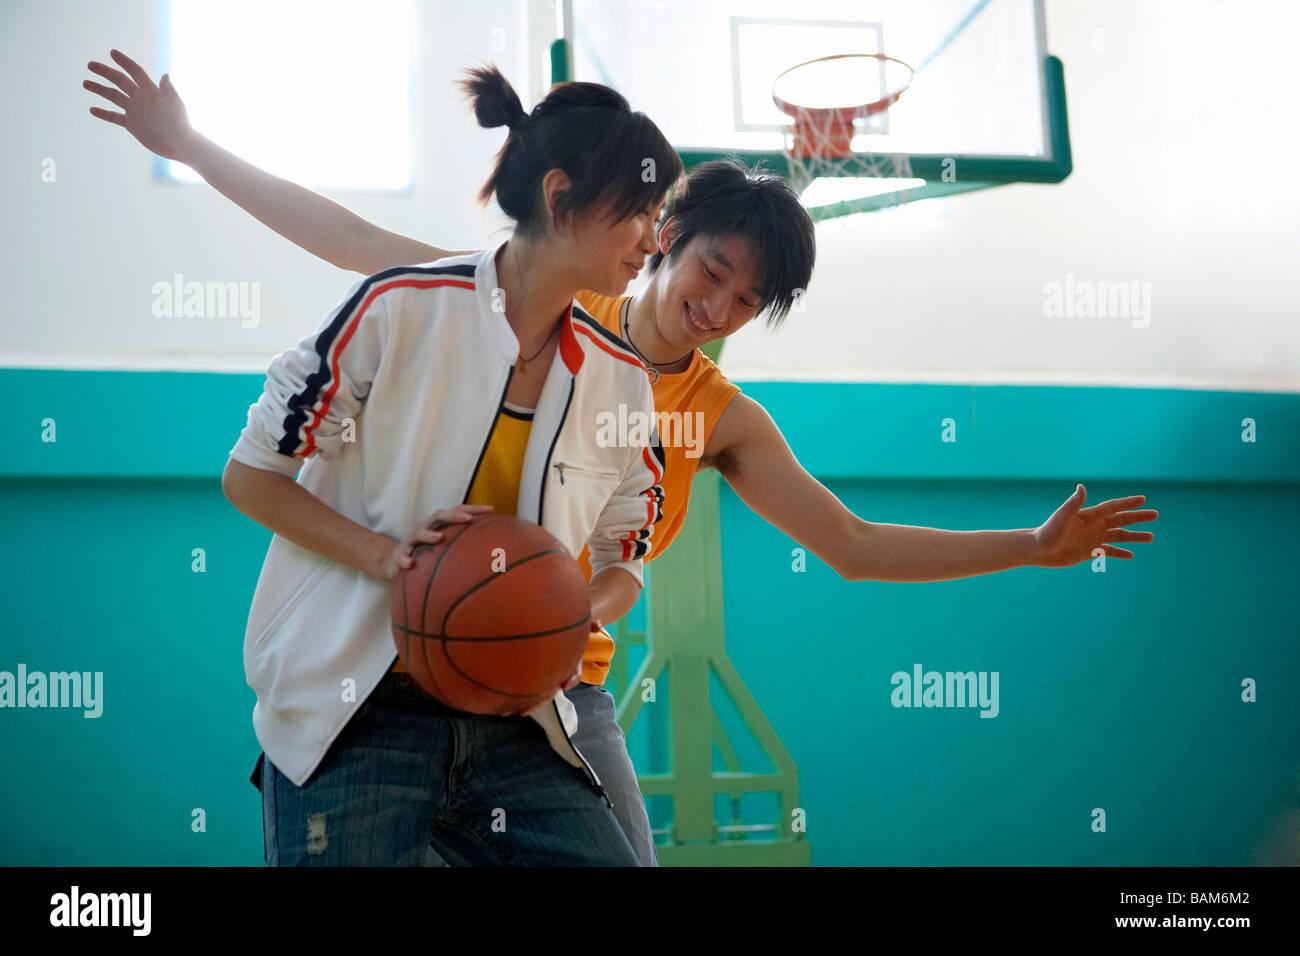 Friends Playing Basketball - Stock Image